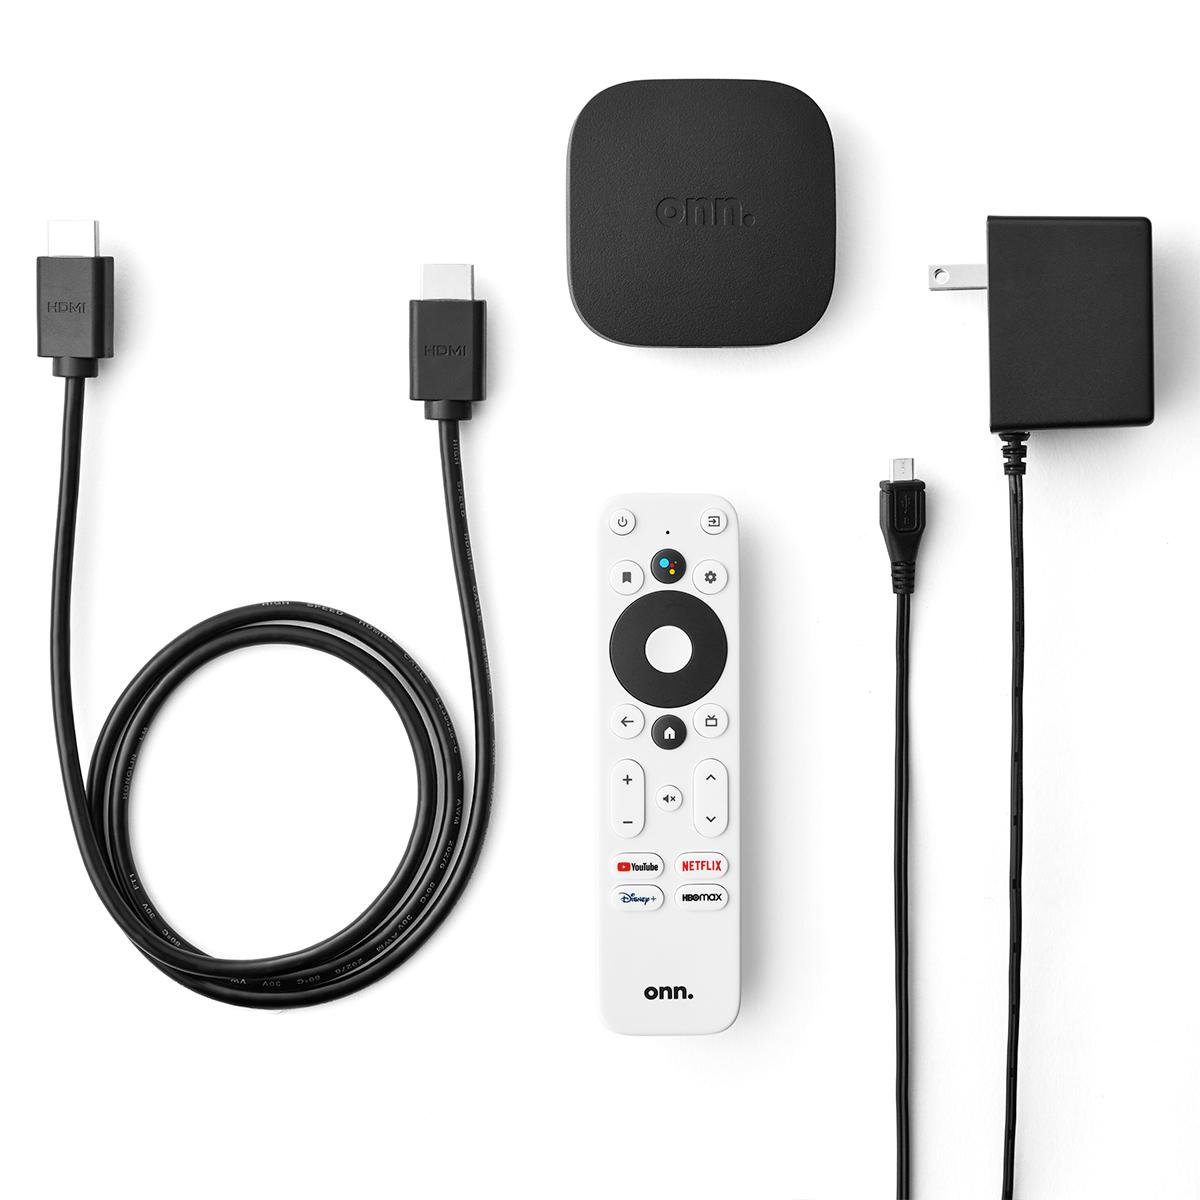 TV Box e TV Stick onn. Android TV da Walmart